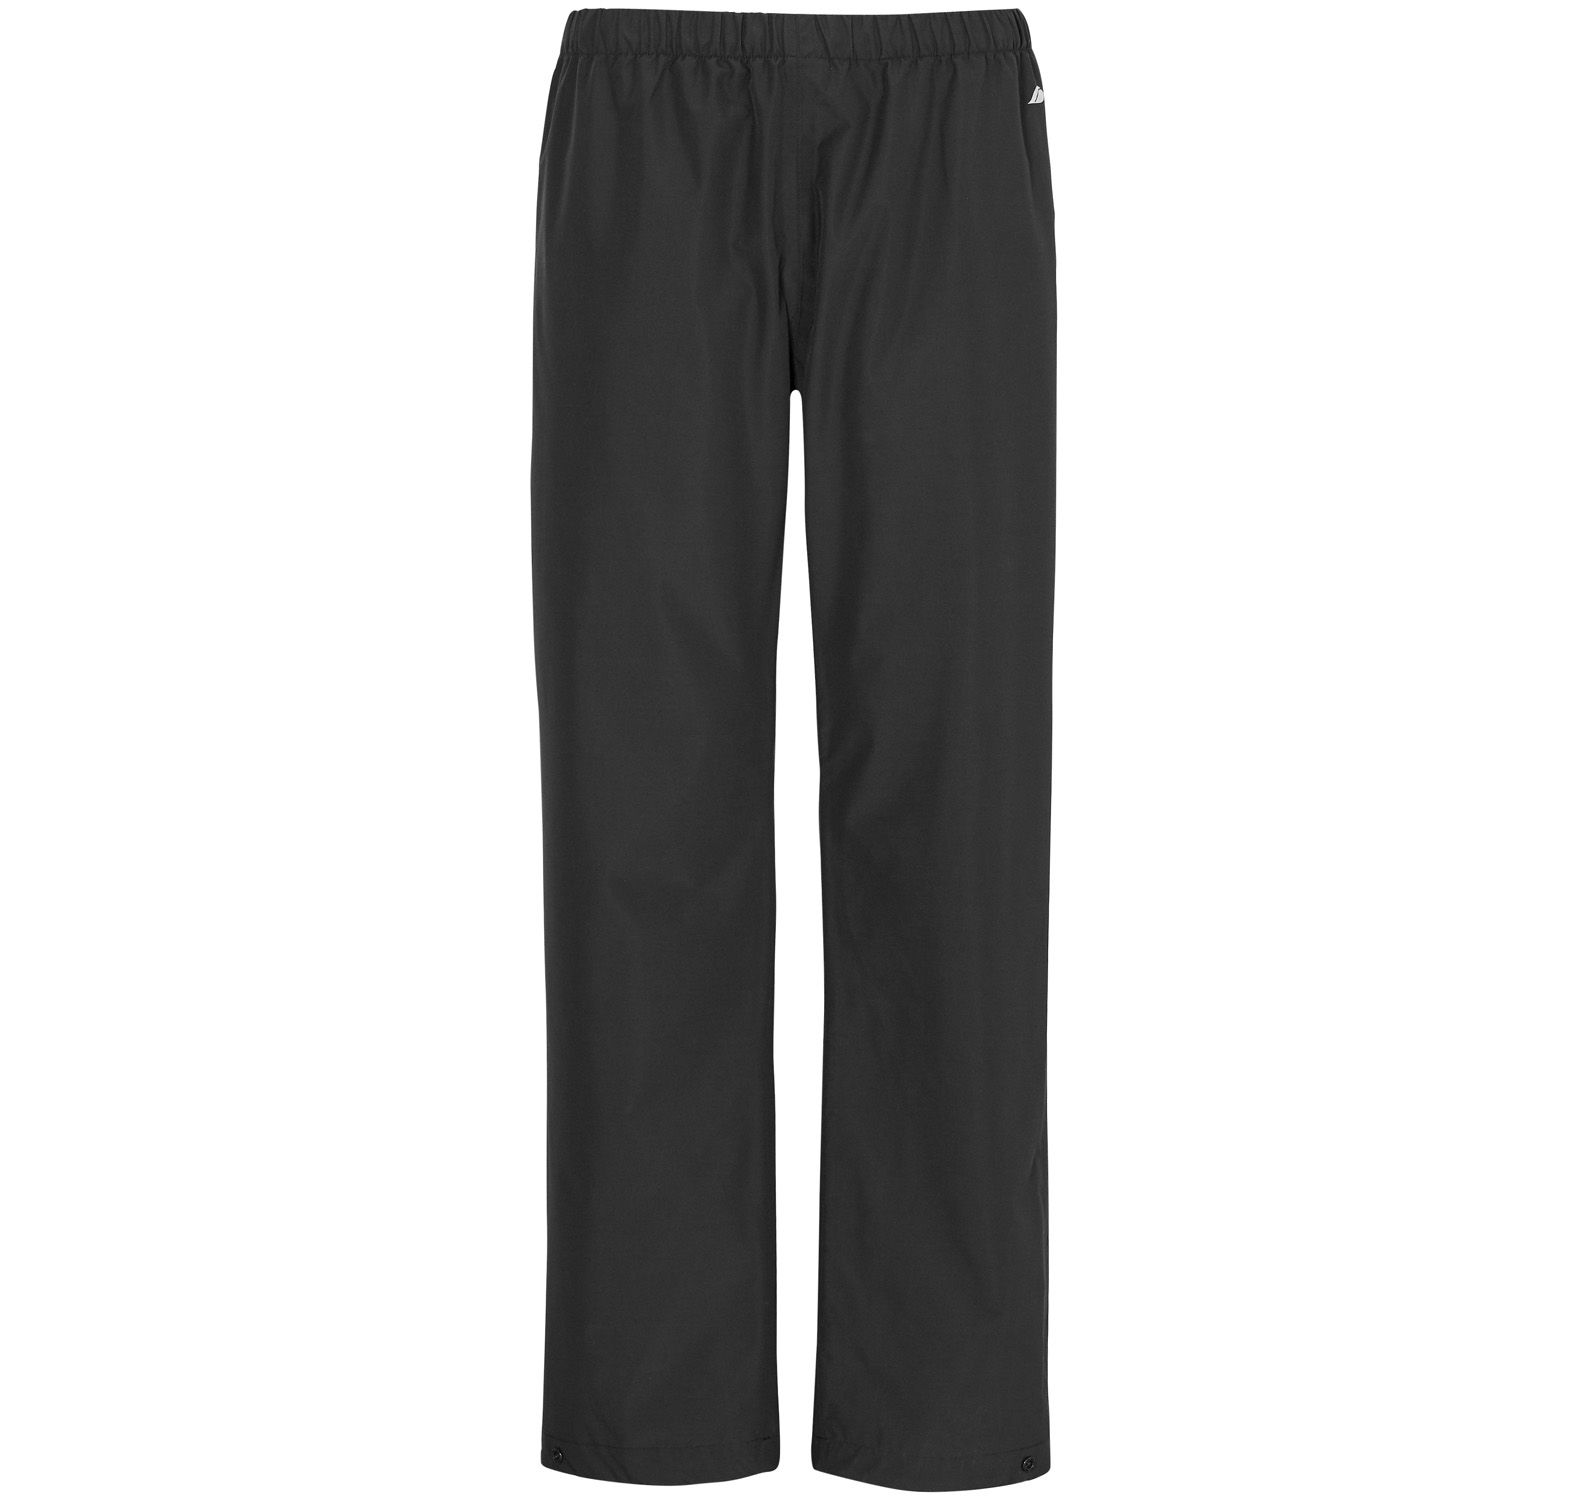 grand usx pants, black, l, didriksons regnkläder